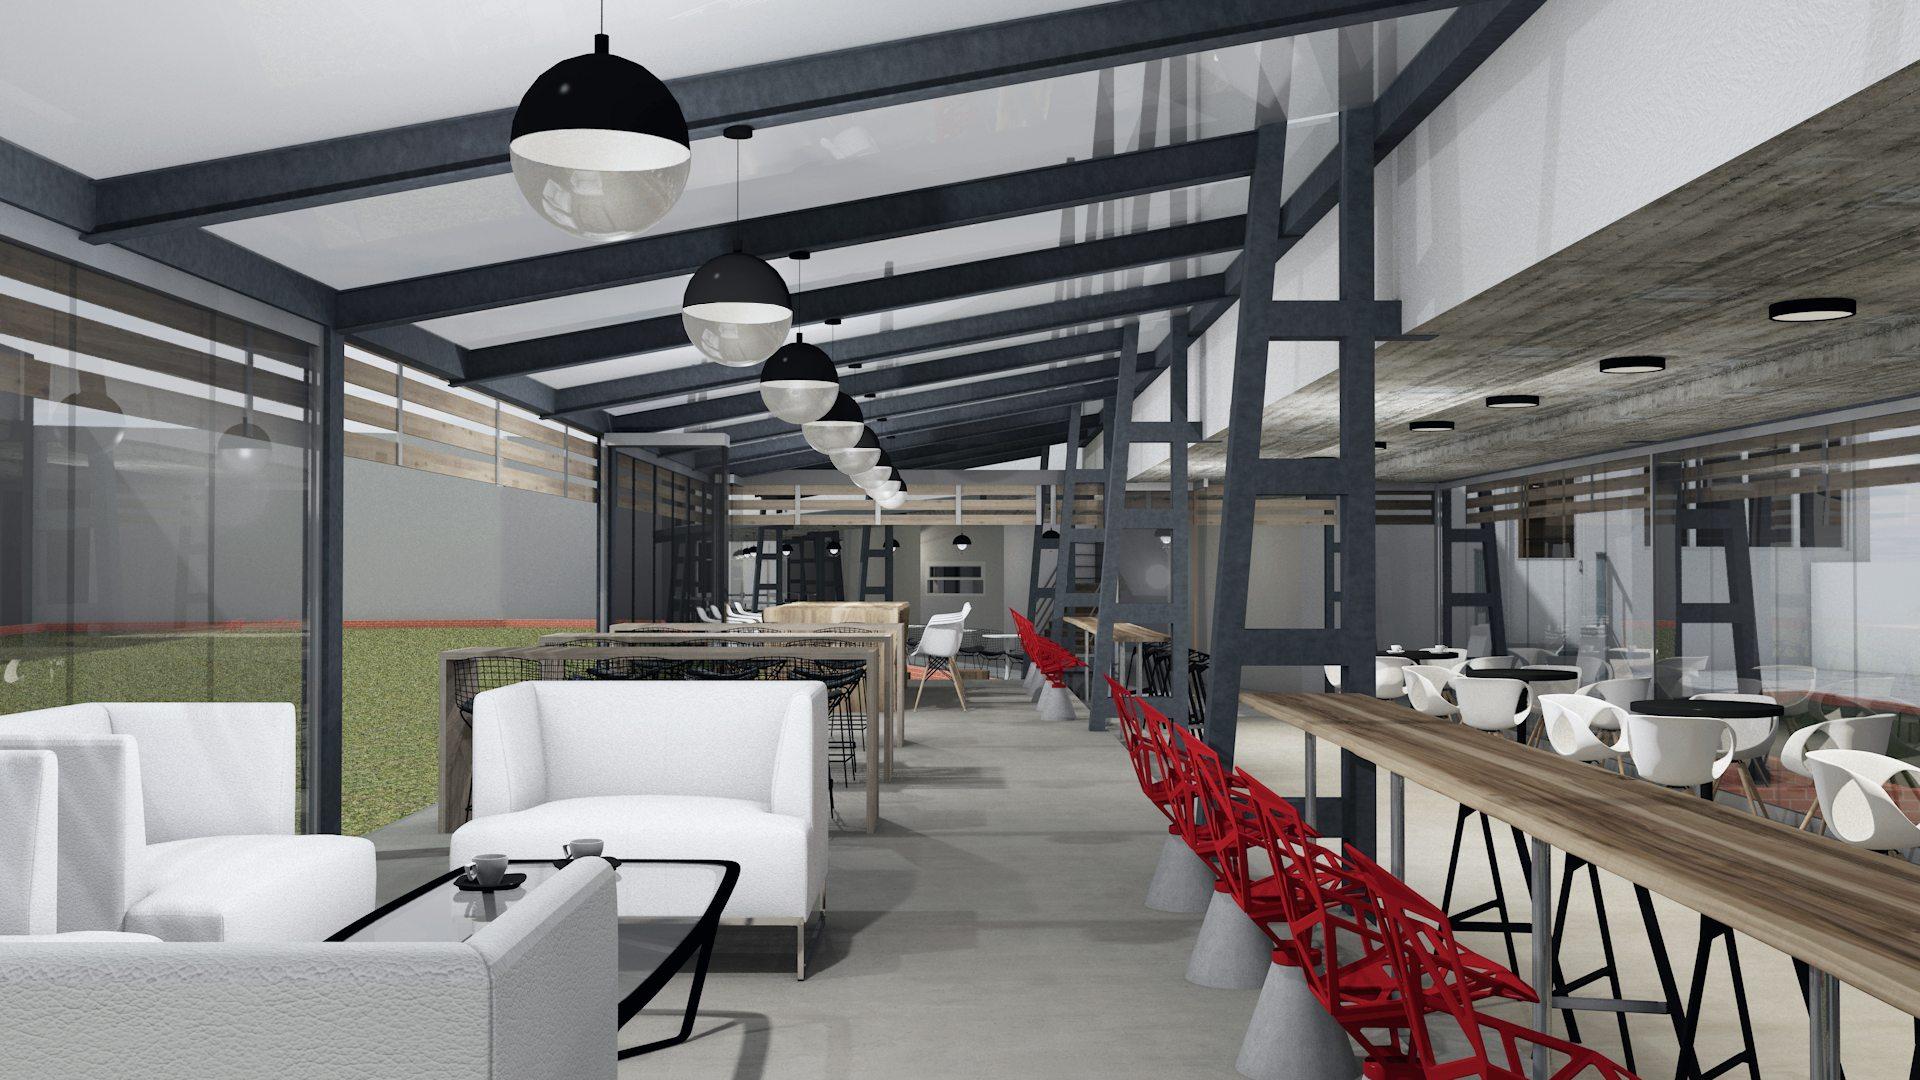 archicostudio_hospital-cafe_lounge-2